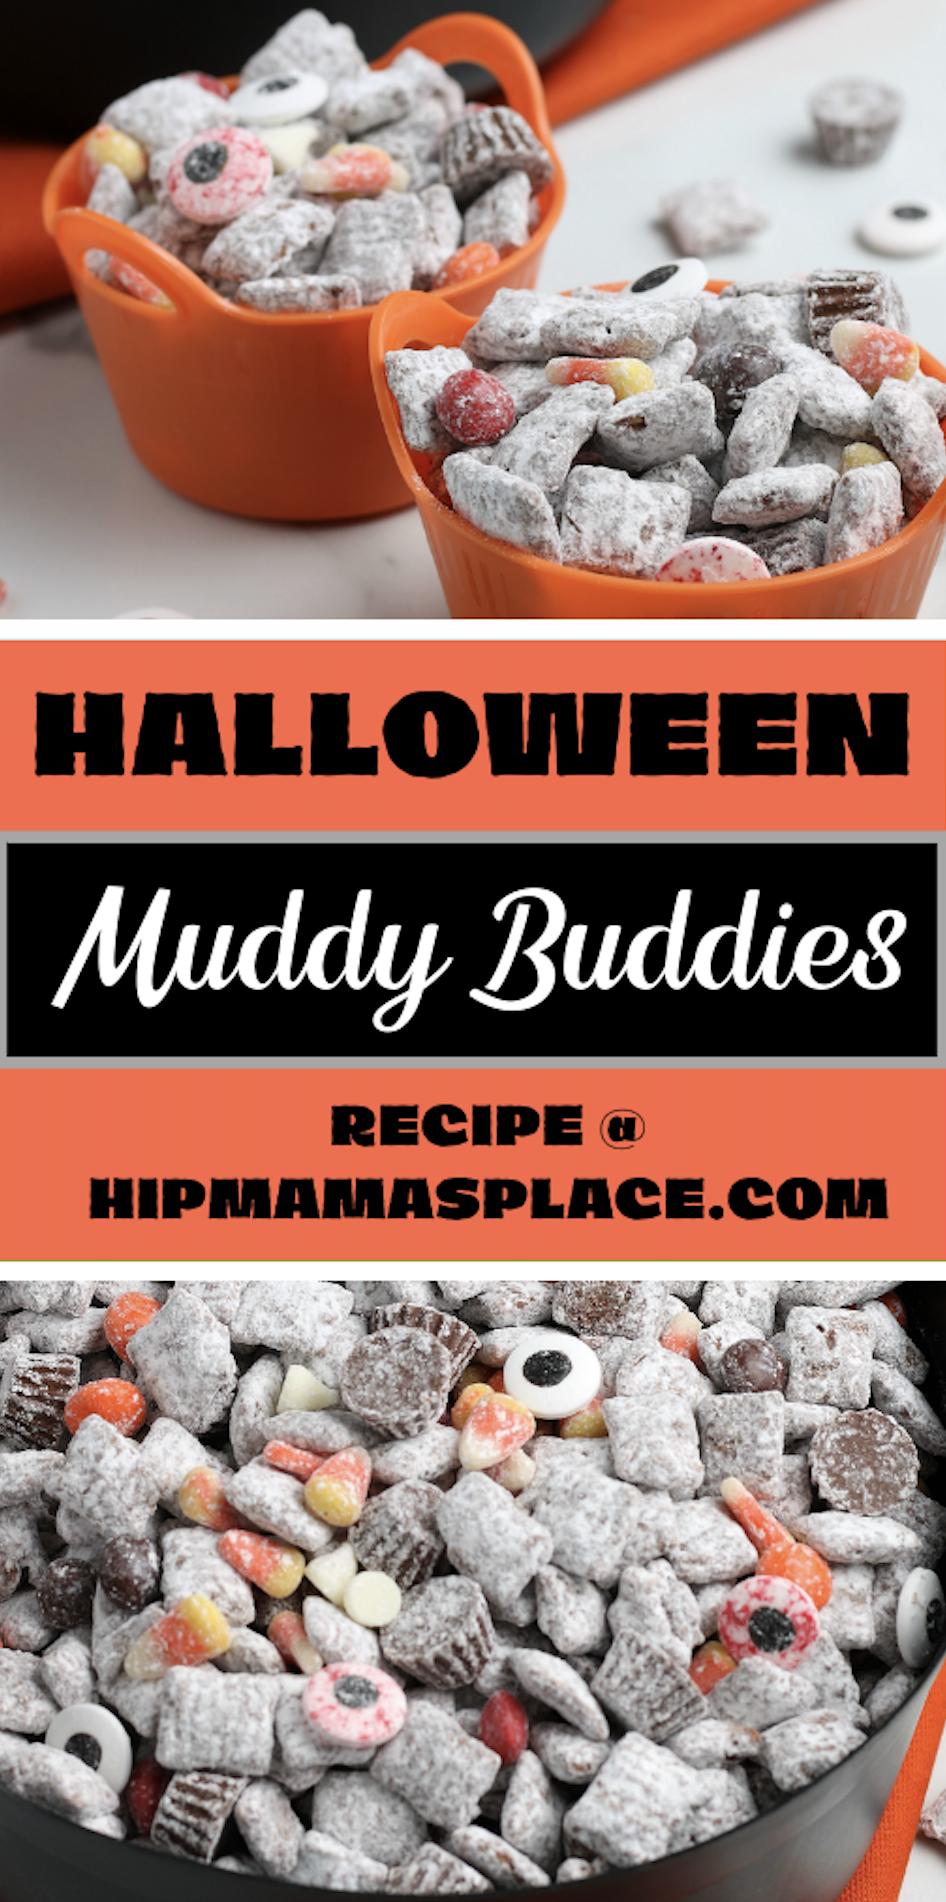 Halloween muddy buddies recipe